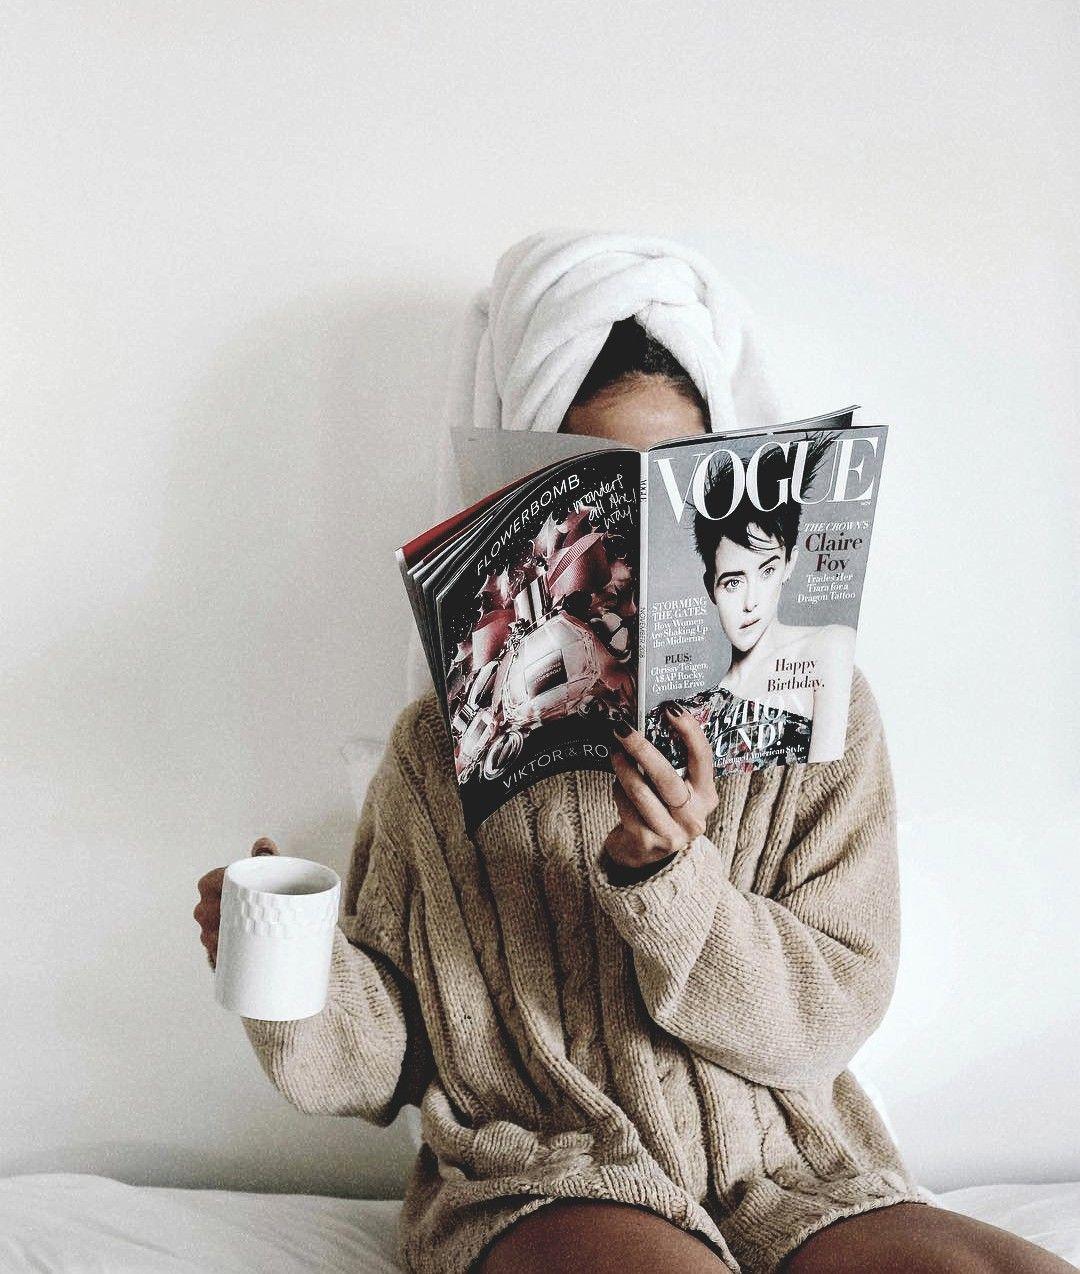 Kkadencemarie Vogue Instagram Reading Magazine Shower Selfcare Girl Aesthetic Fashion Blogger Photography Blogger Photography Aesthetic Photography